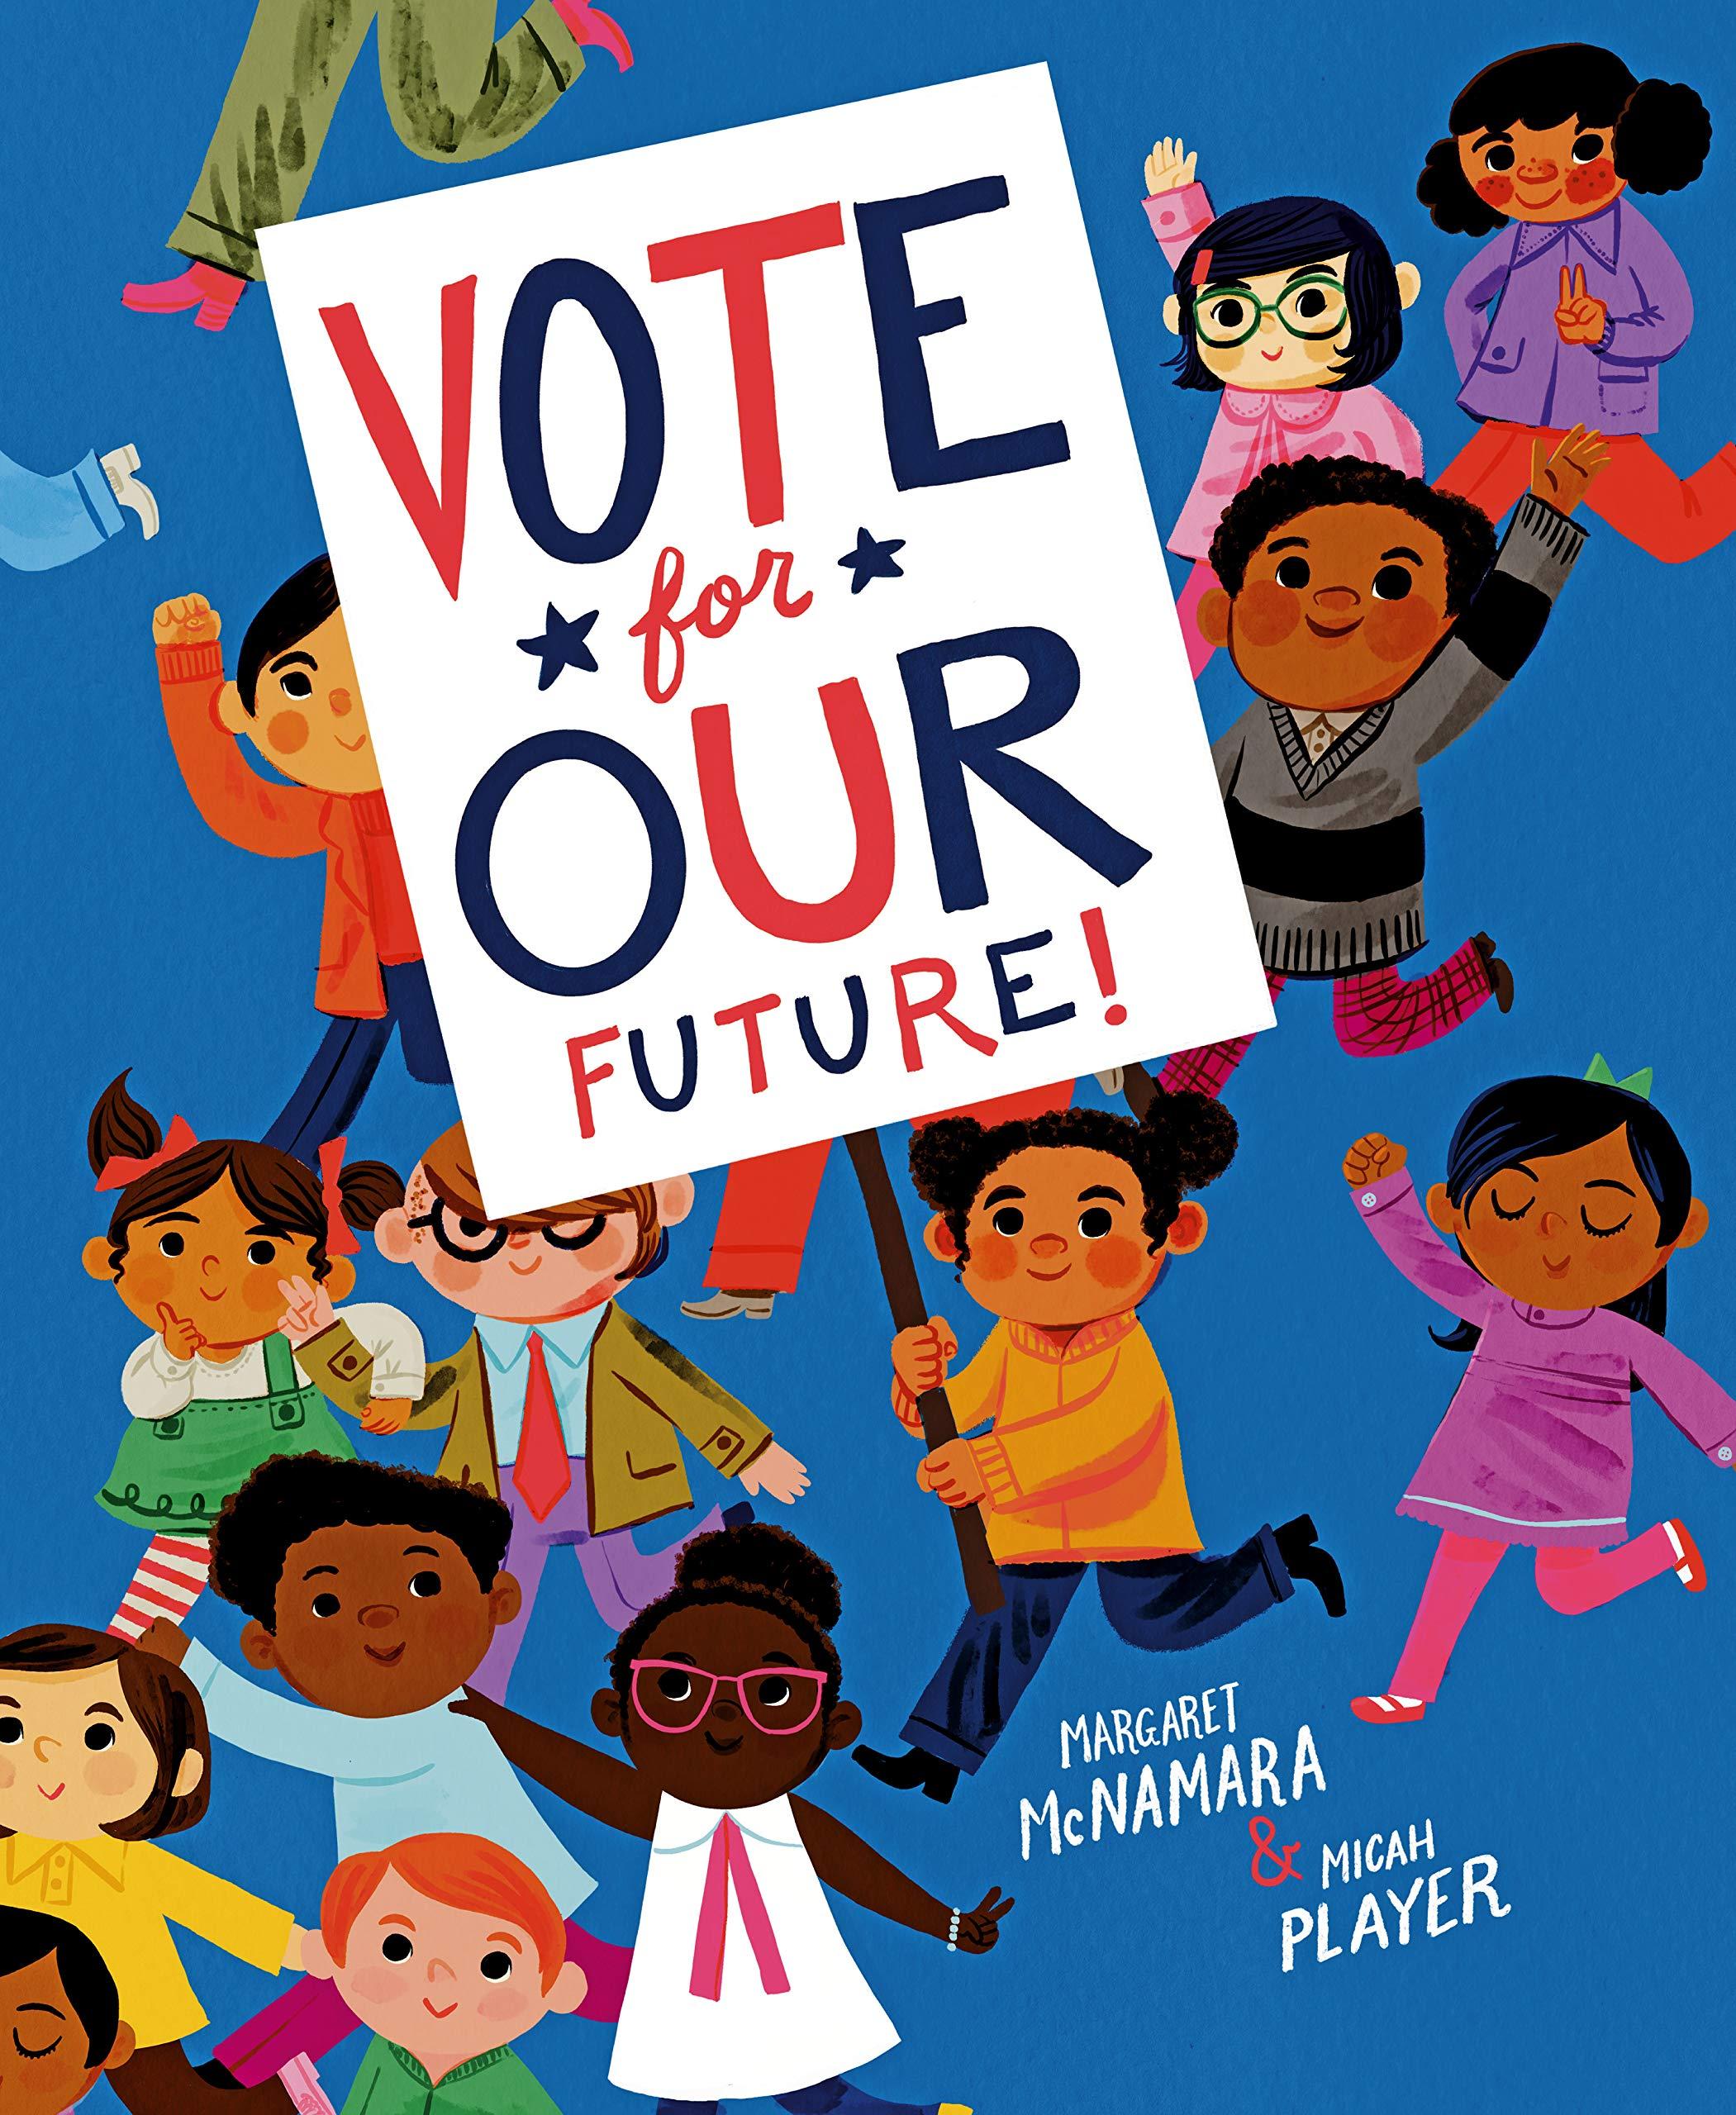 Image result for vote for our future mcnamara